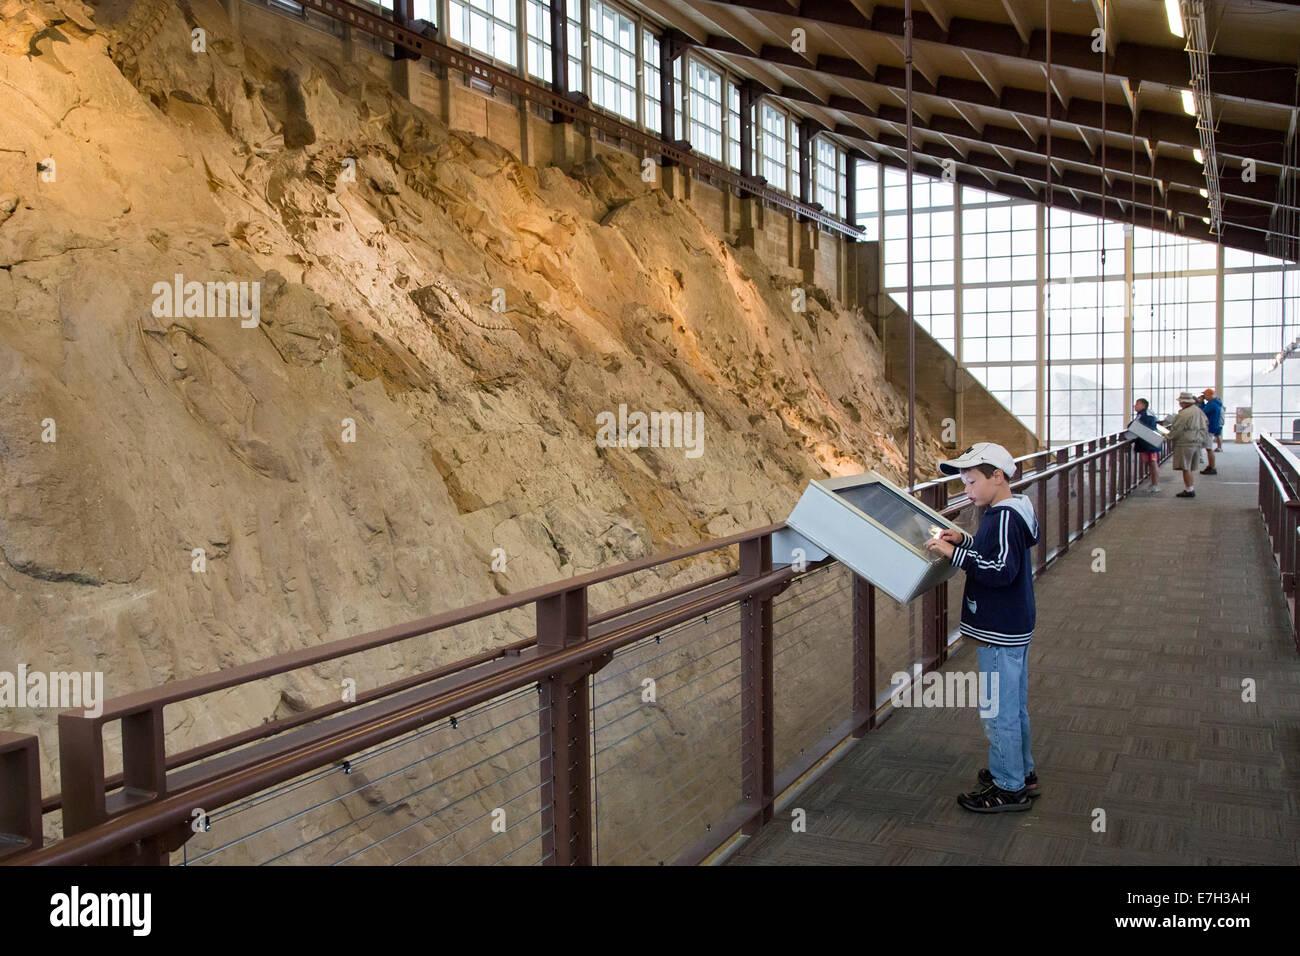 Jensen, Utah - A boy views dinosaur bones in the Quarry Exhibit Hall at Dinosaur National Monument. - Stock Image